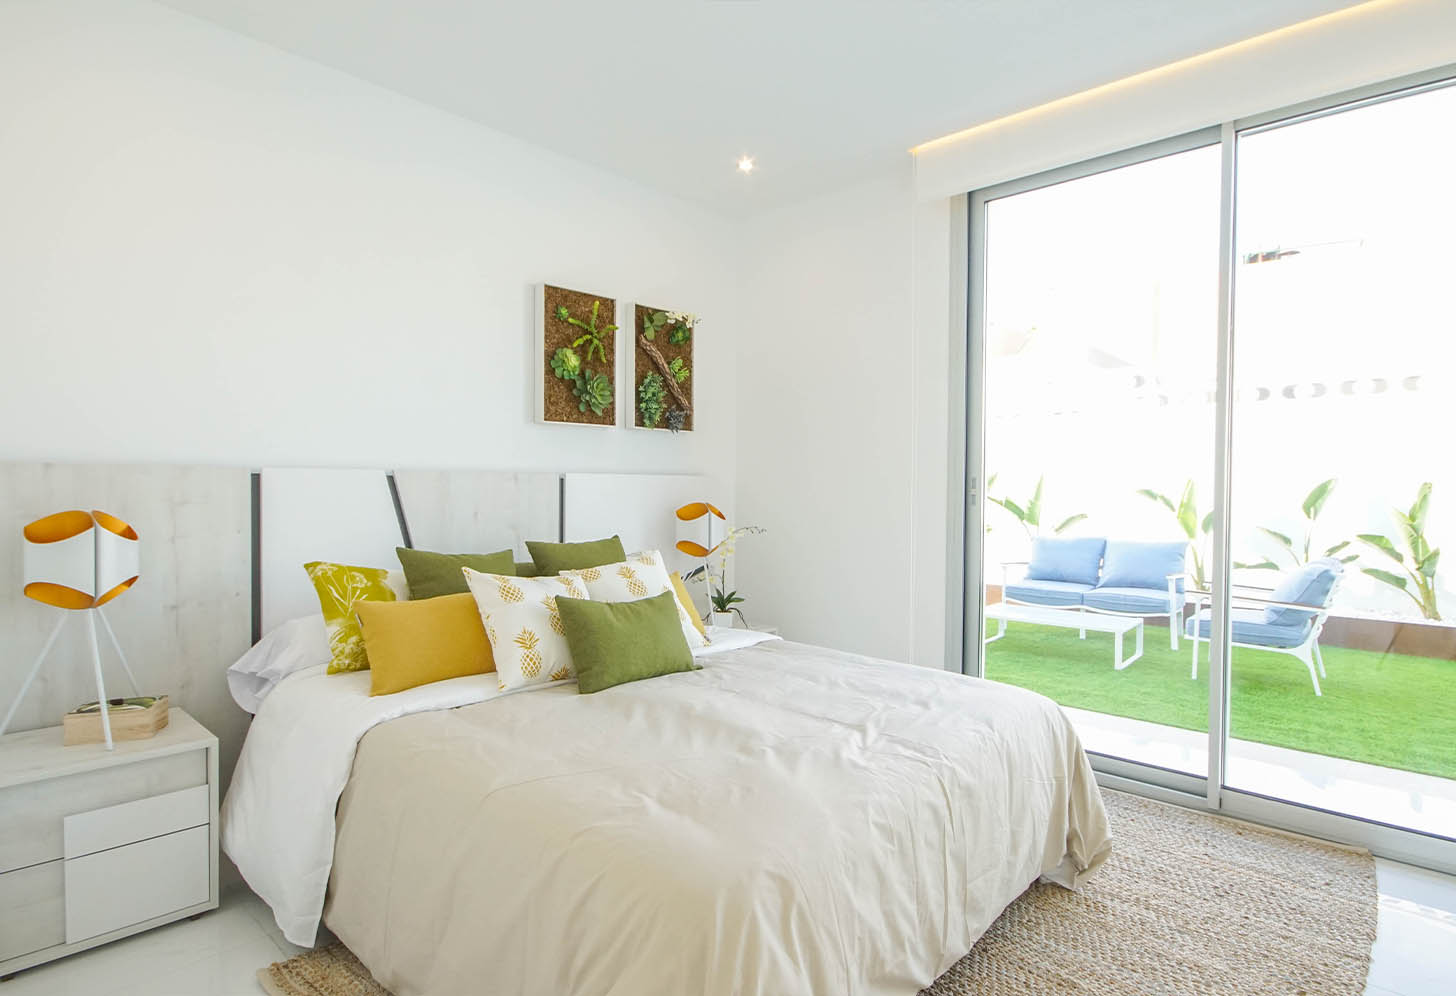 immobilier neuf espagne costa blanca on-k1 gold villas chambre 1